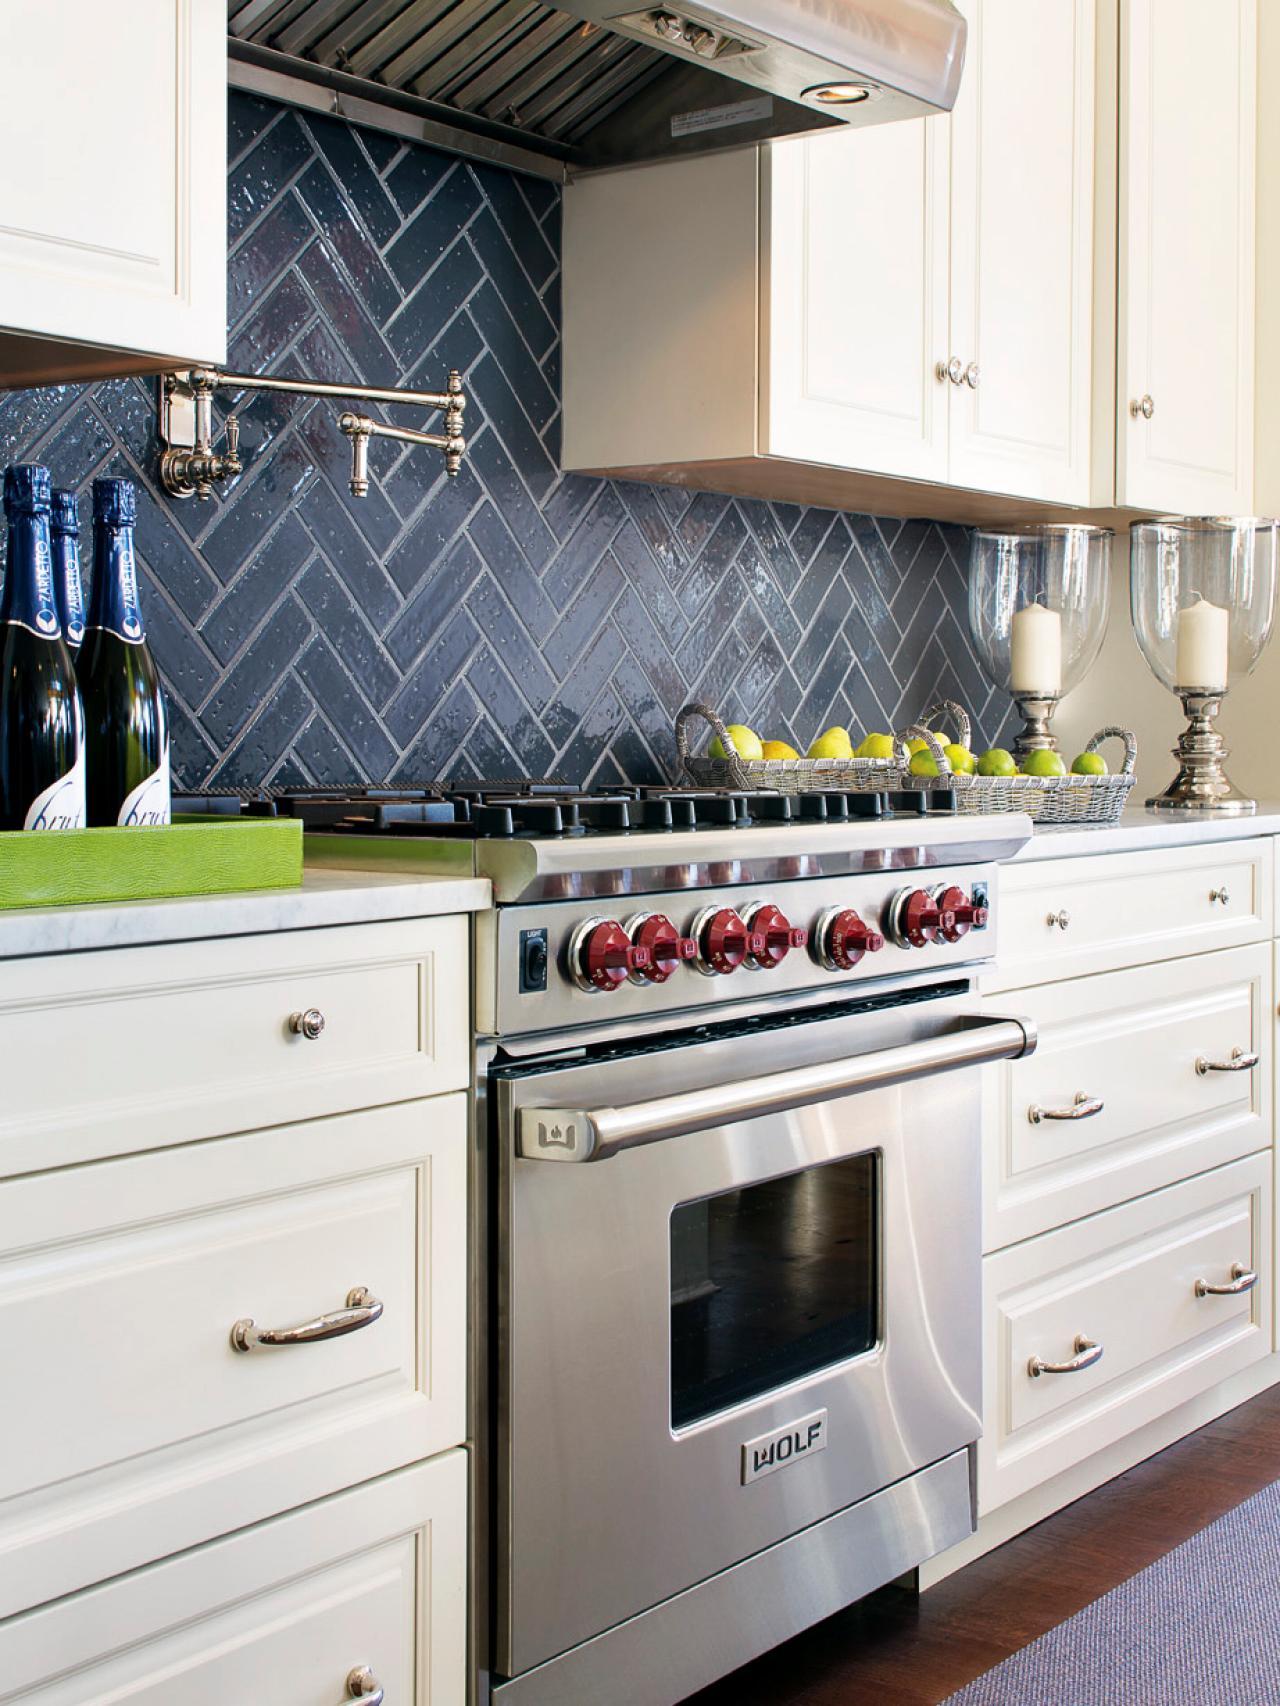 Artd Peel And Stick Kitchen Or Bathroom Backsplash Tile